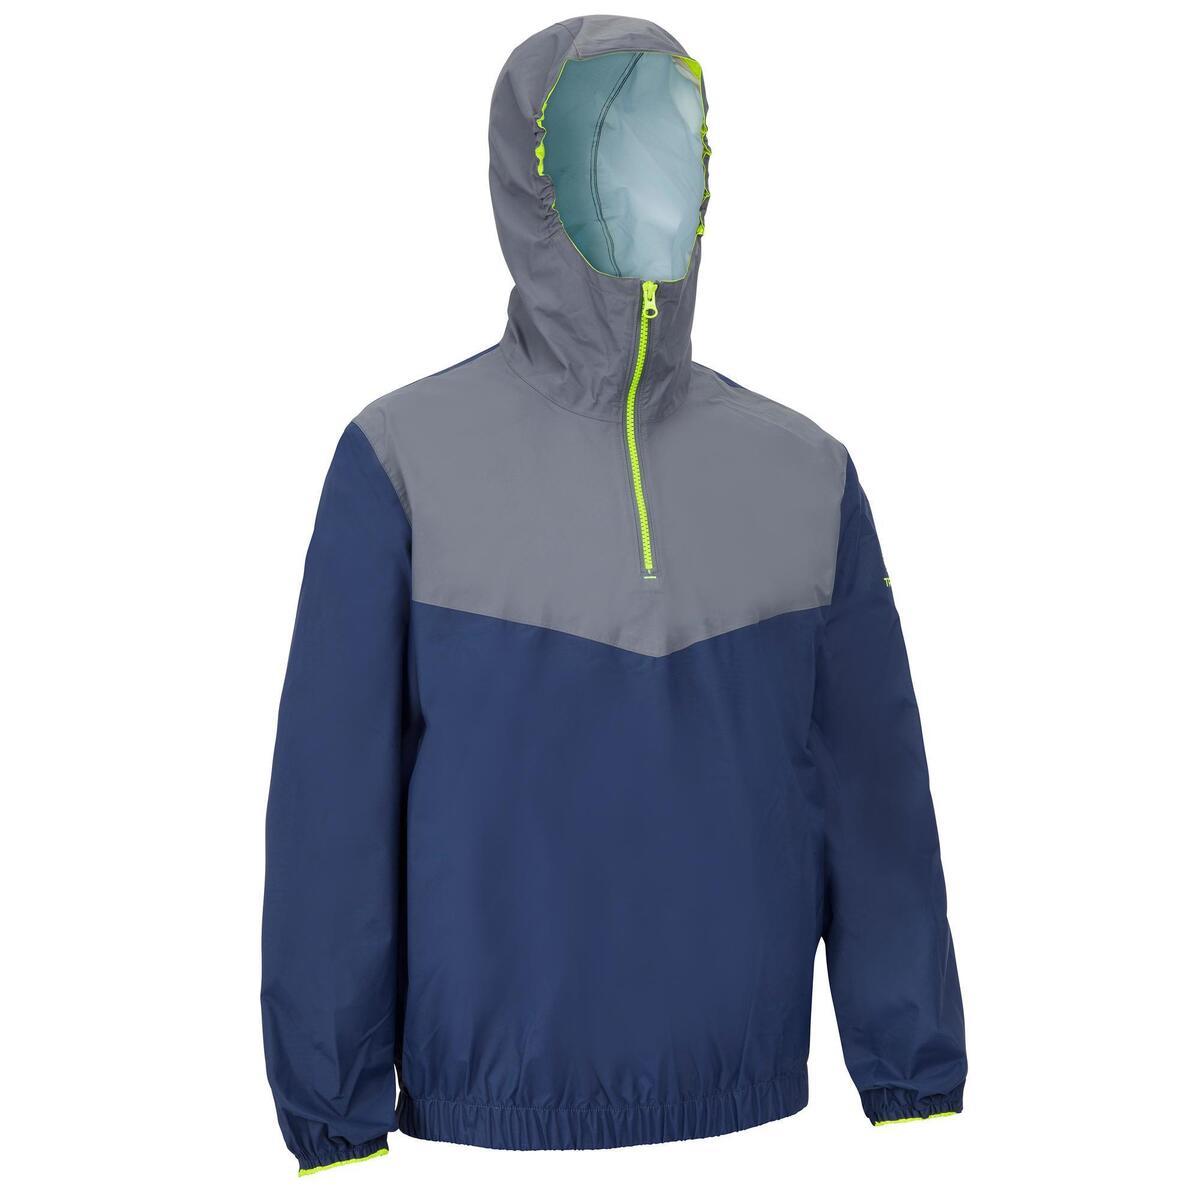 Bild 1 von Segeljacke Dinghy 100 winddicht Erwachsene blau/grau